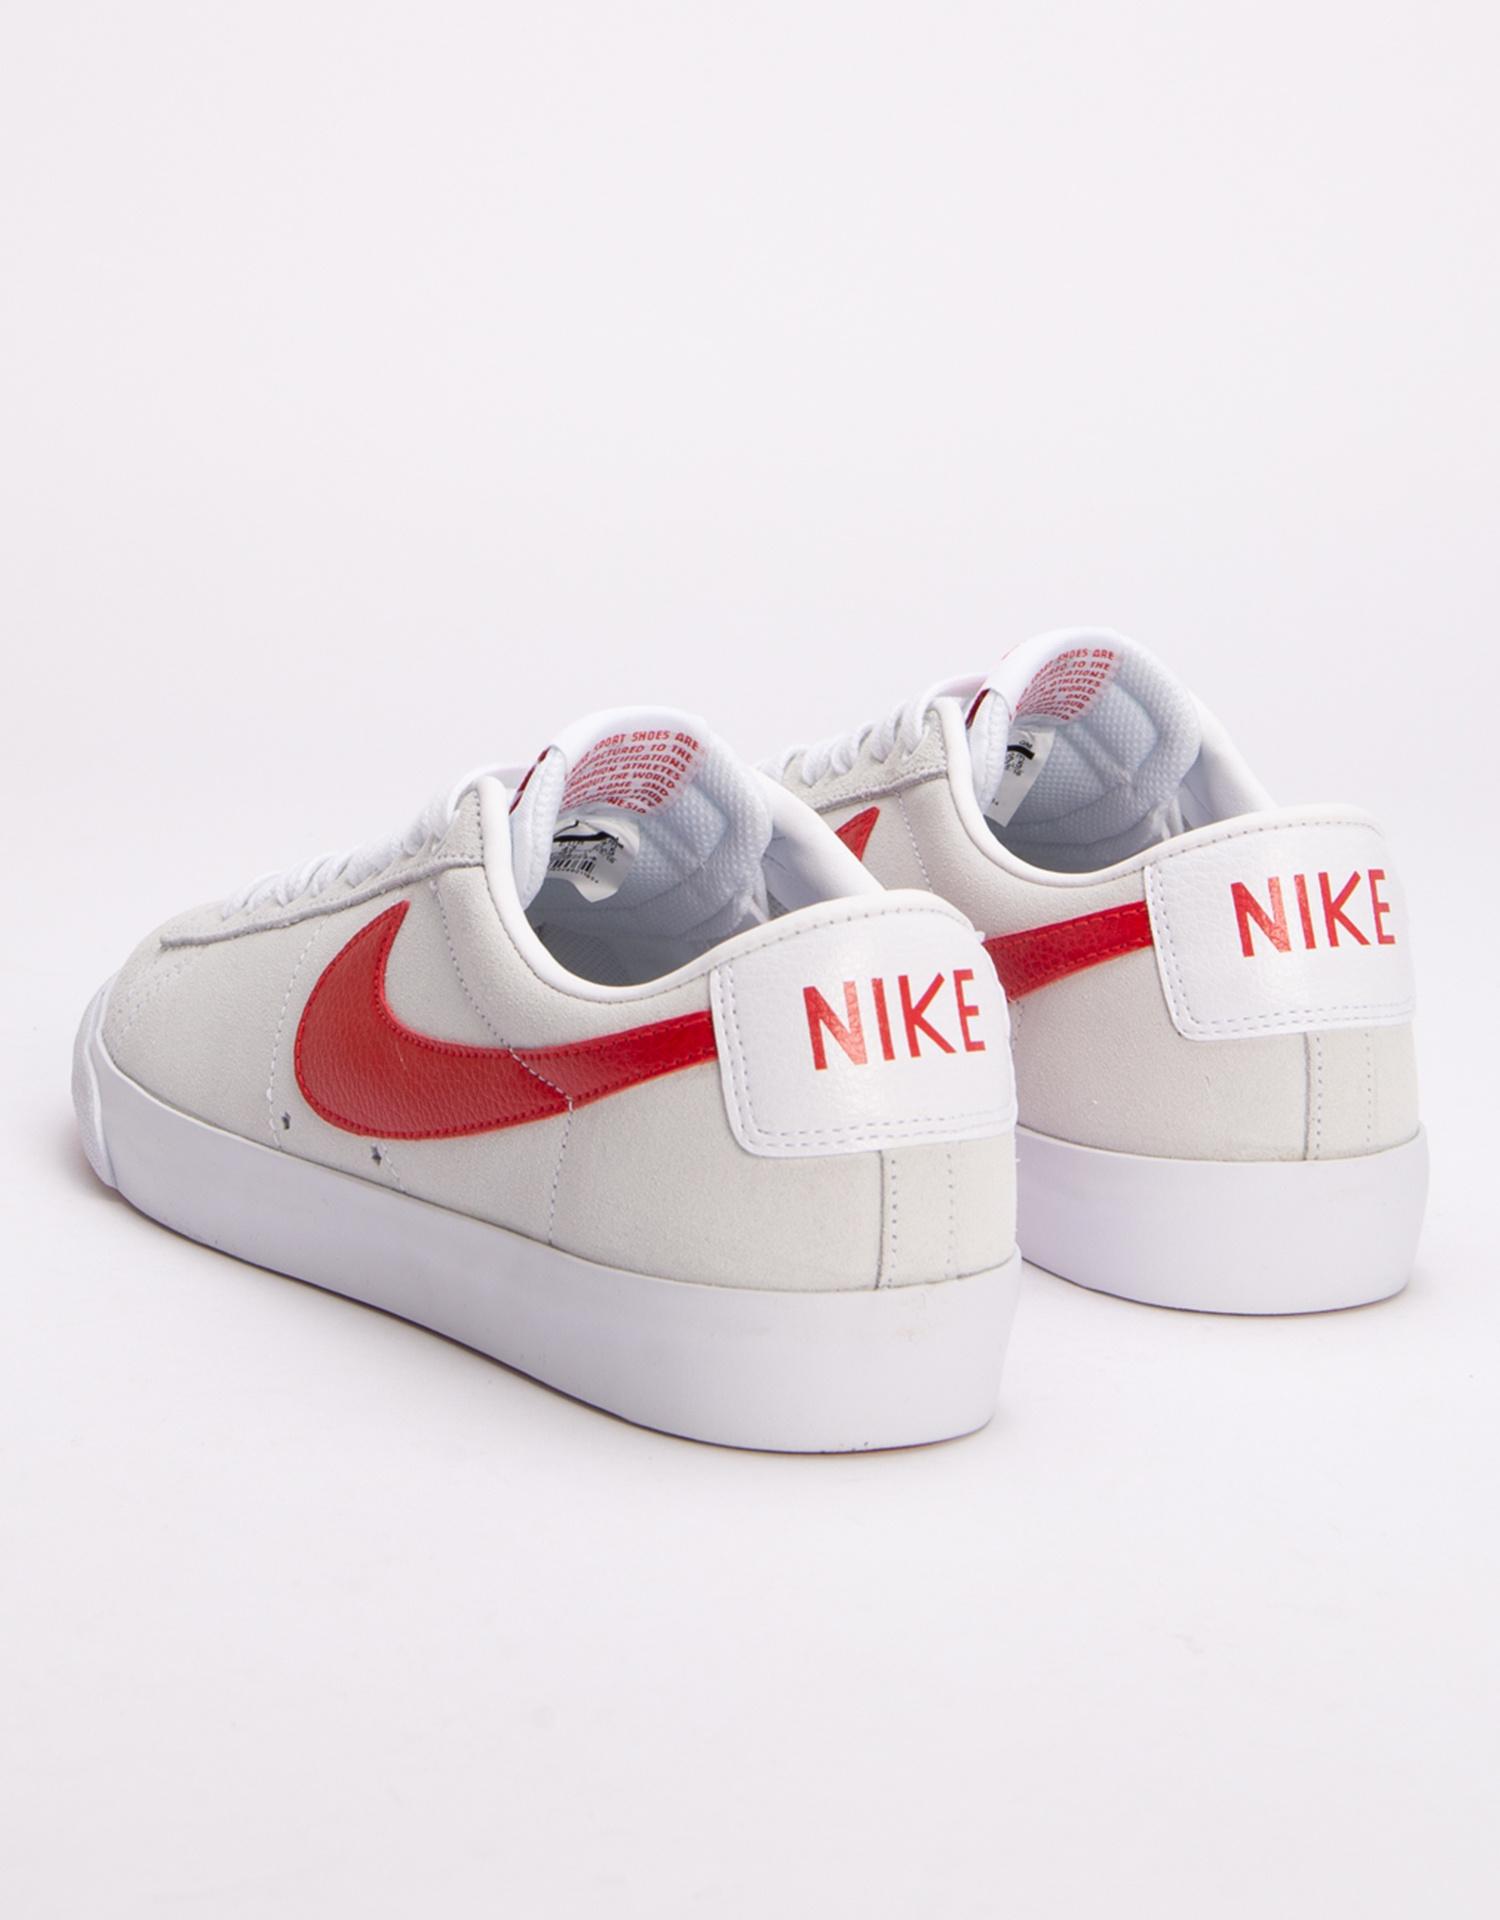 Nike SB Blazer Low GT White/University Red